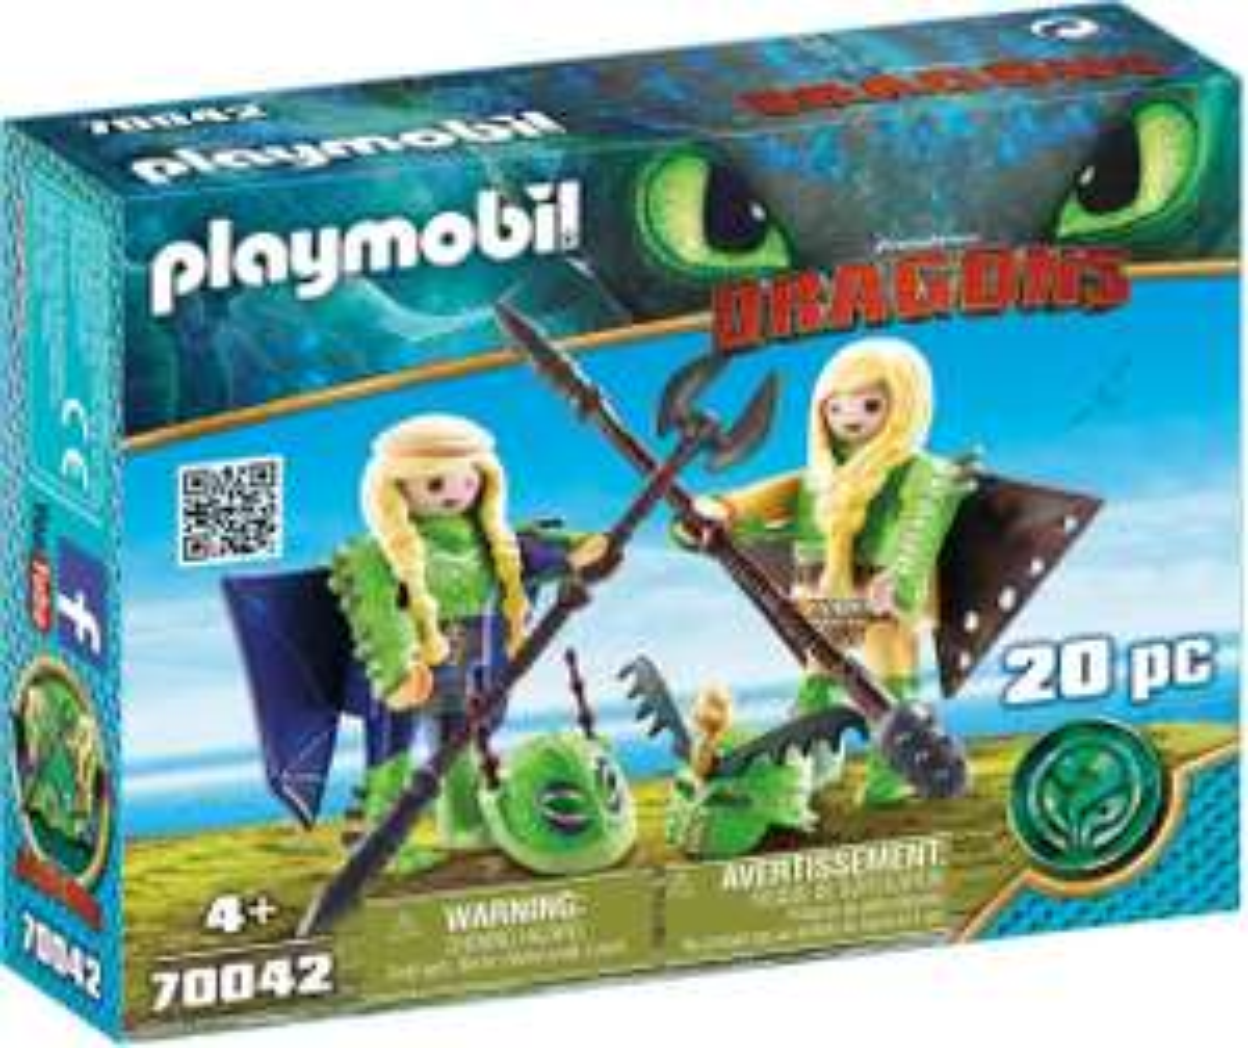 Playmobil 70042 - Dragons Schorrie & Morrie